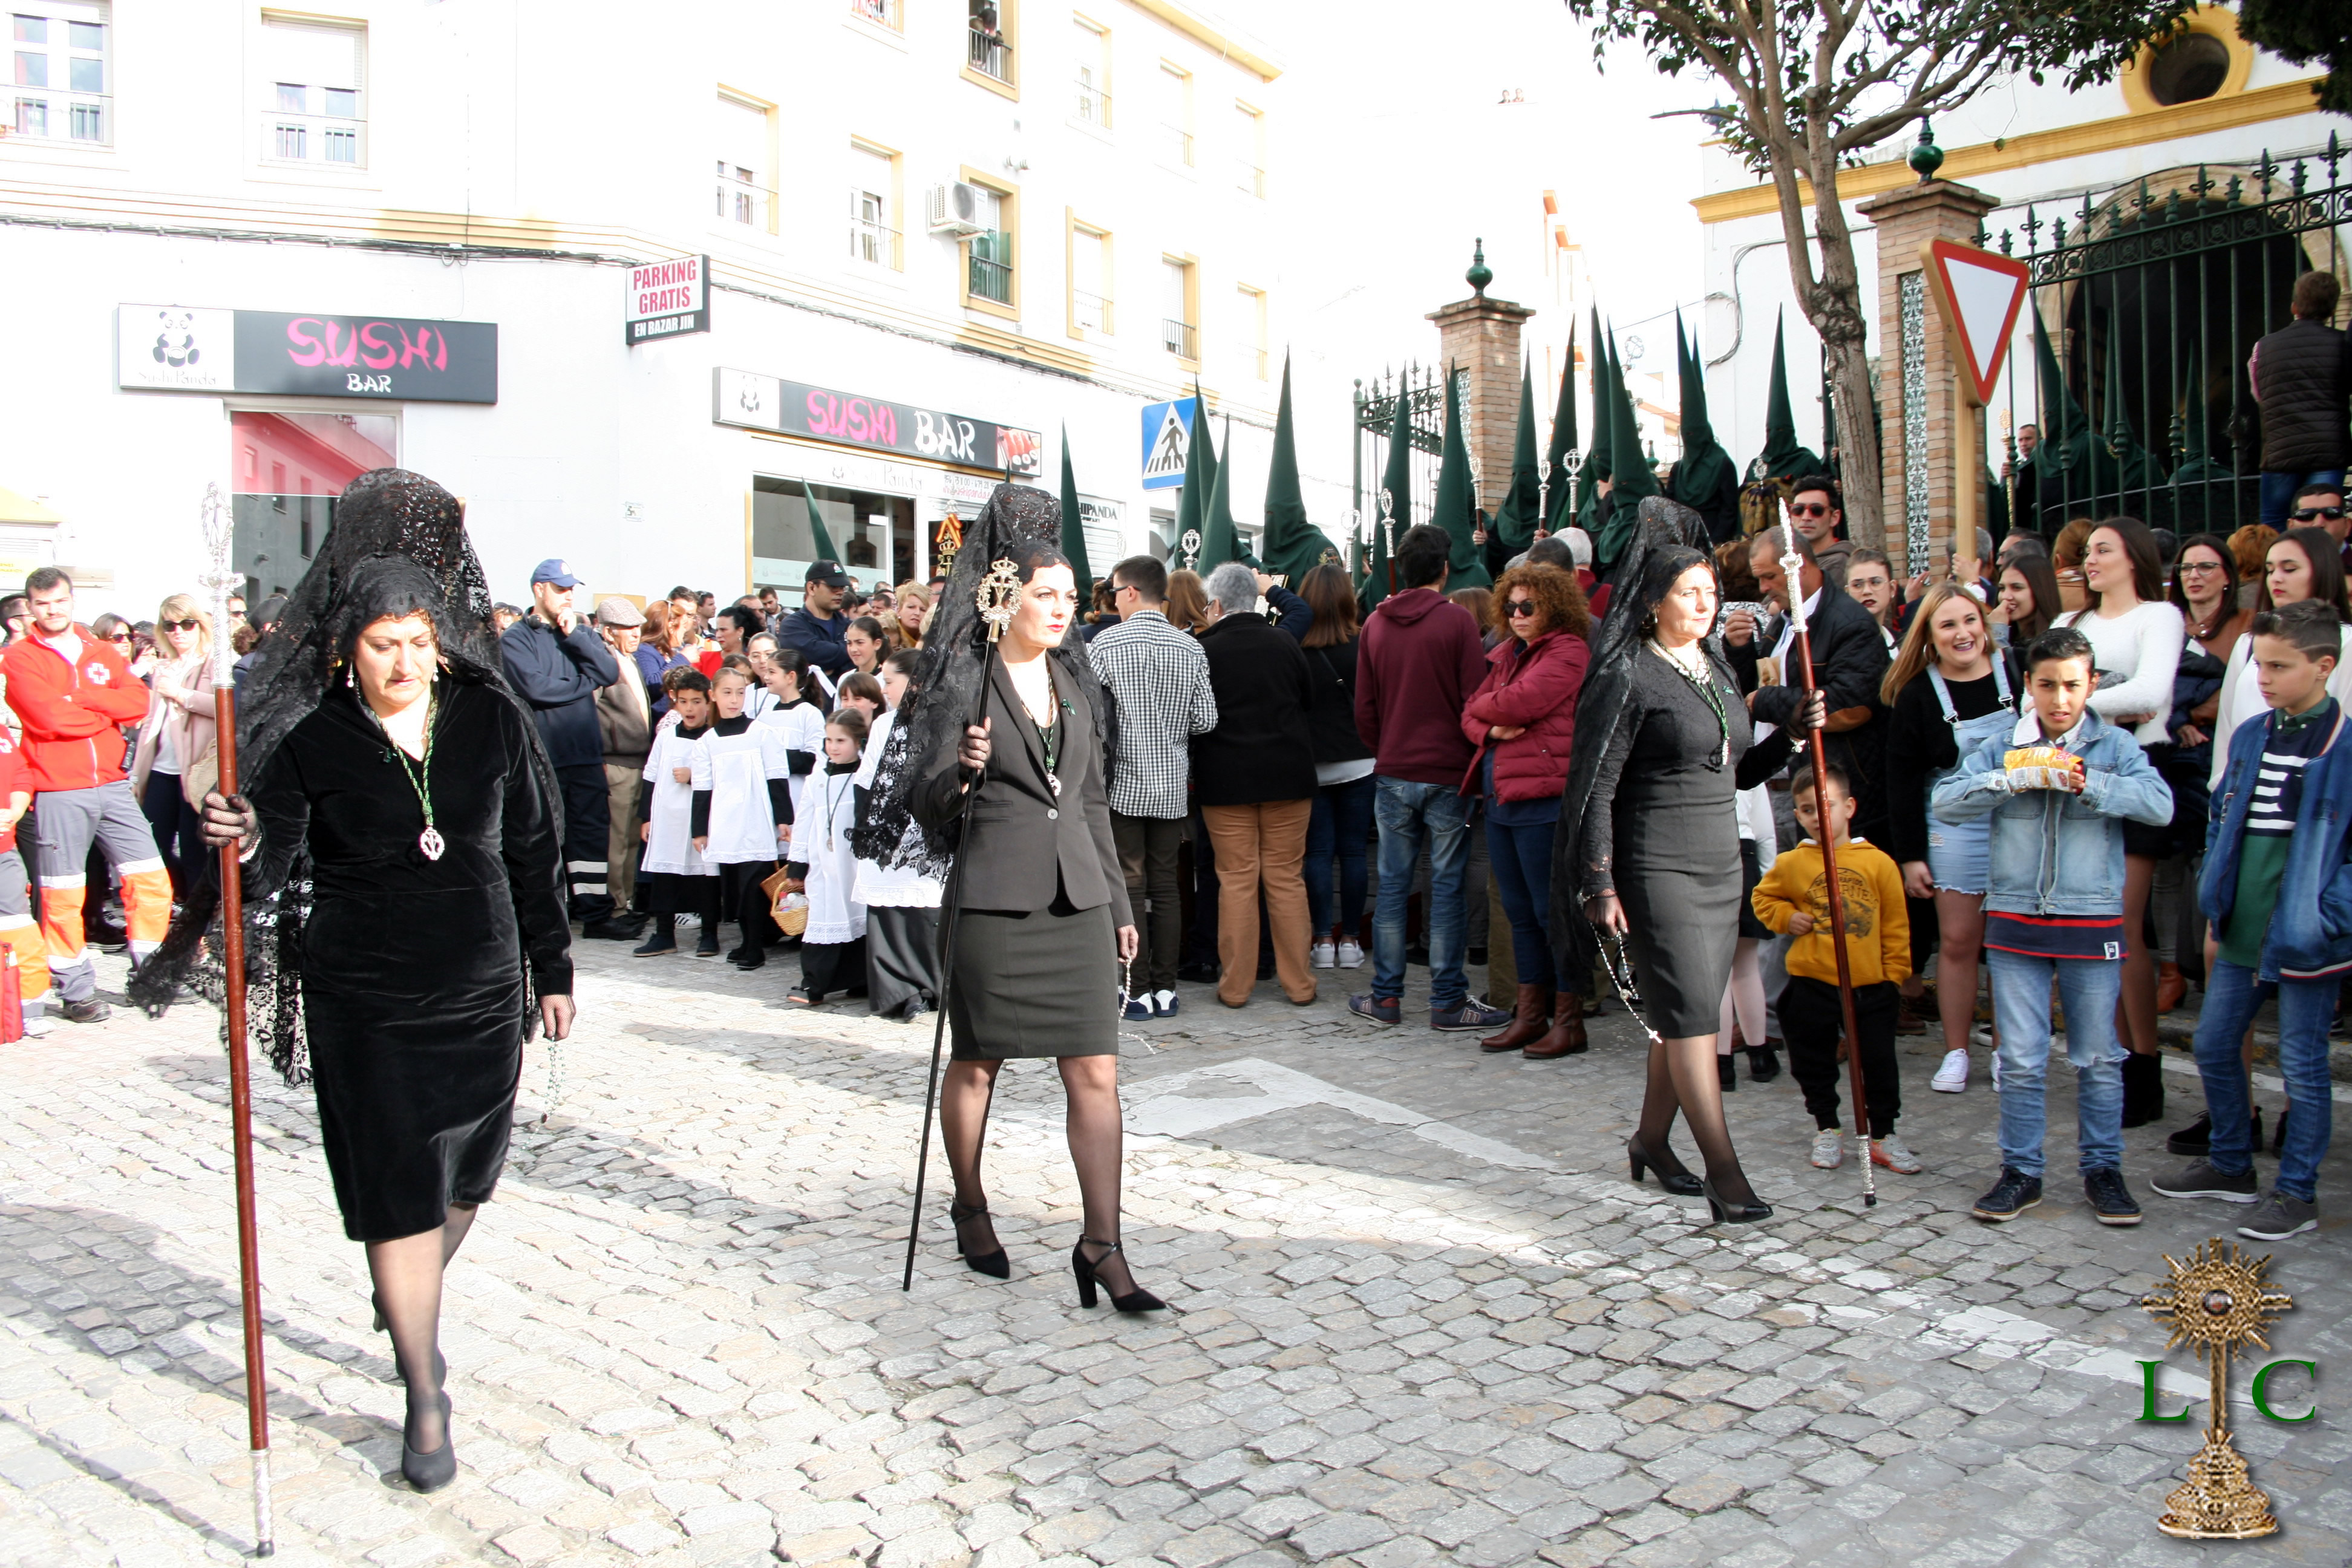 www.lignumcrucis.es-vera-cruz-chiclana-estacion-2019-12